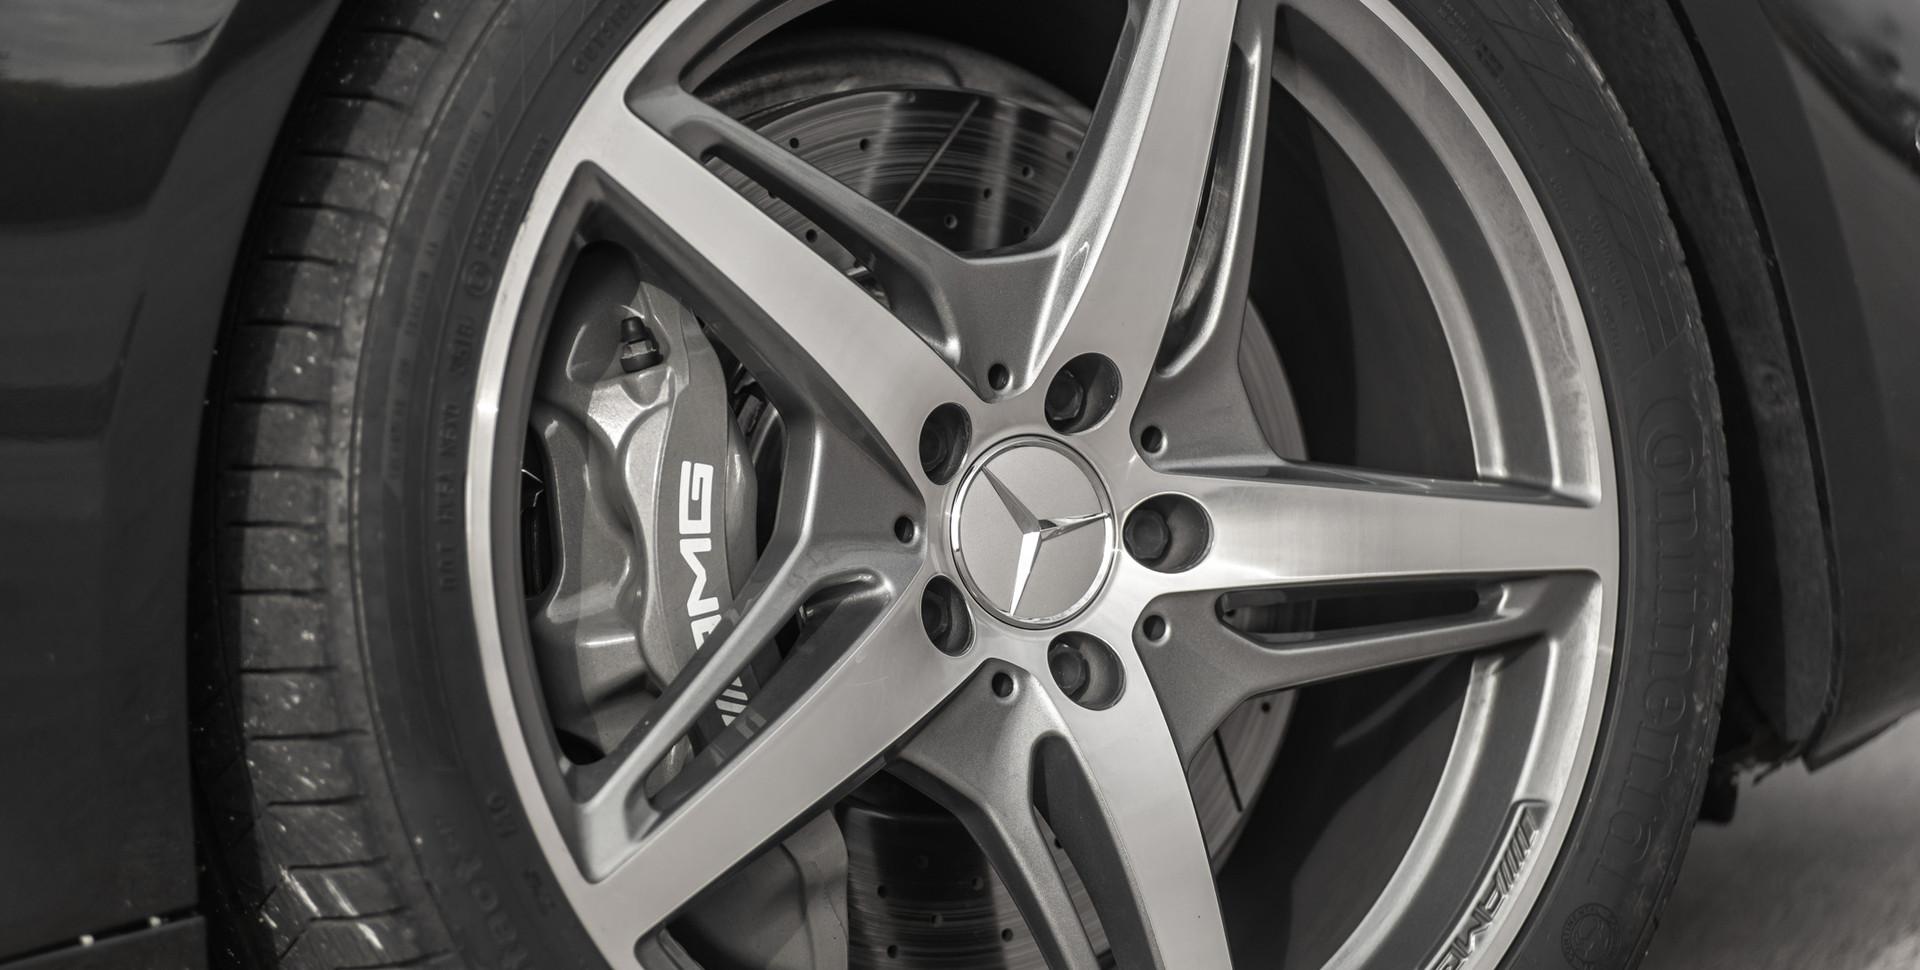 MB AMG GT Cabrio-3.jpg.JPG